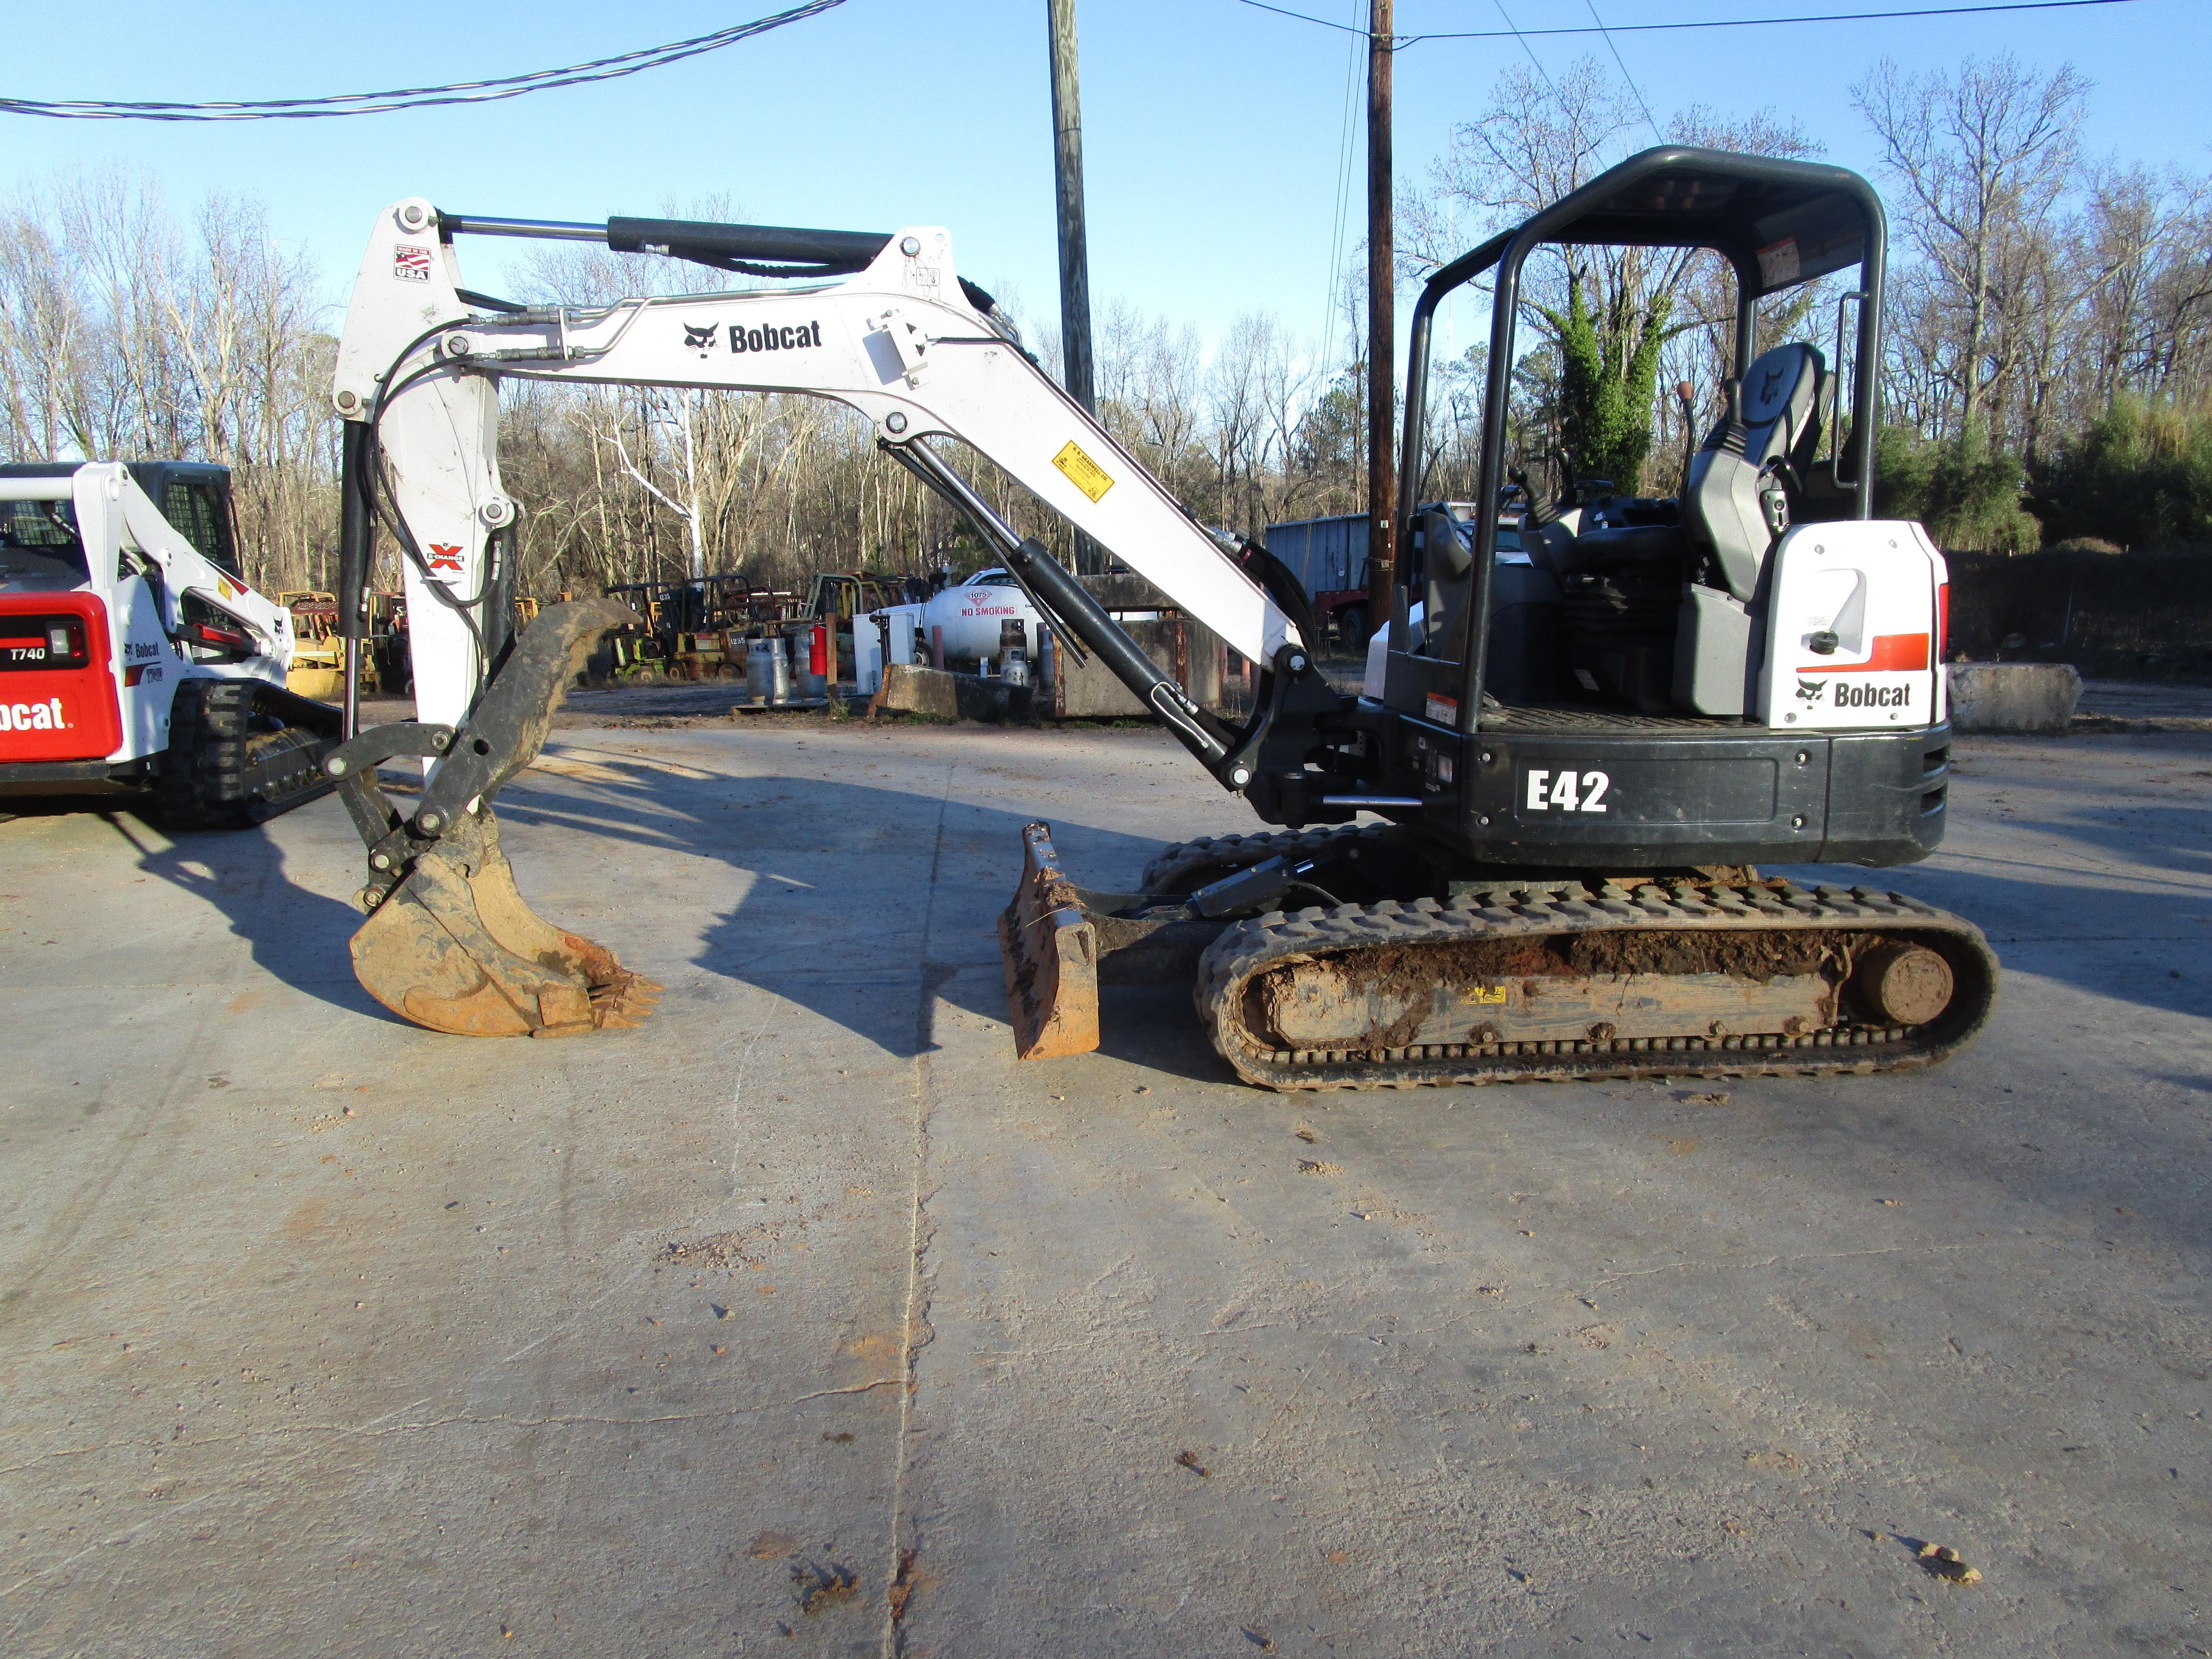 Used, 2018, Bobcat, E42, Excavators